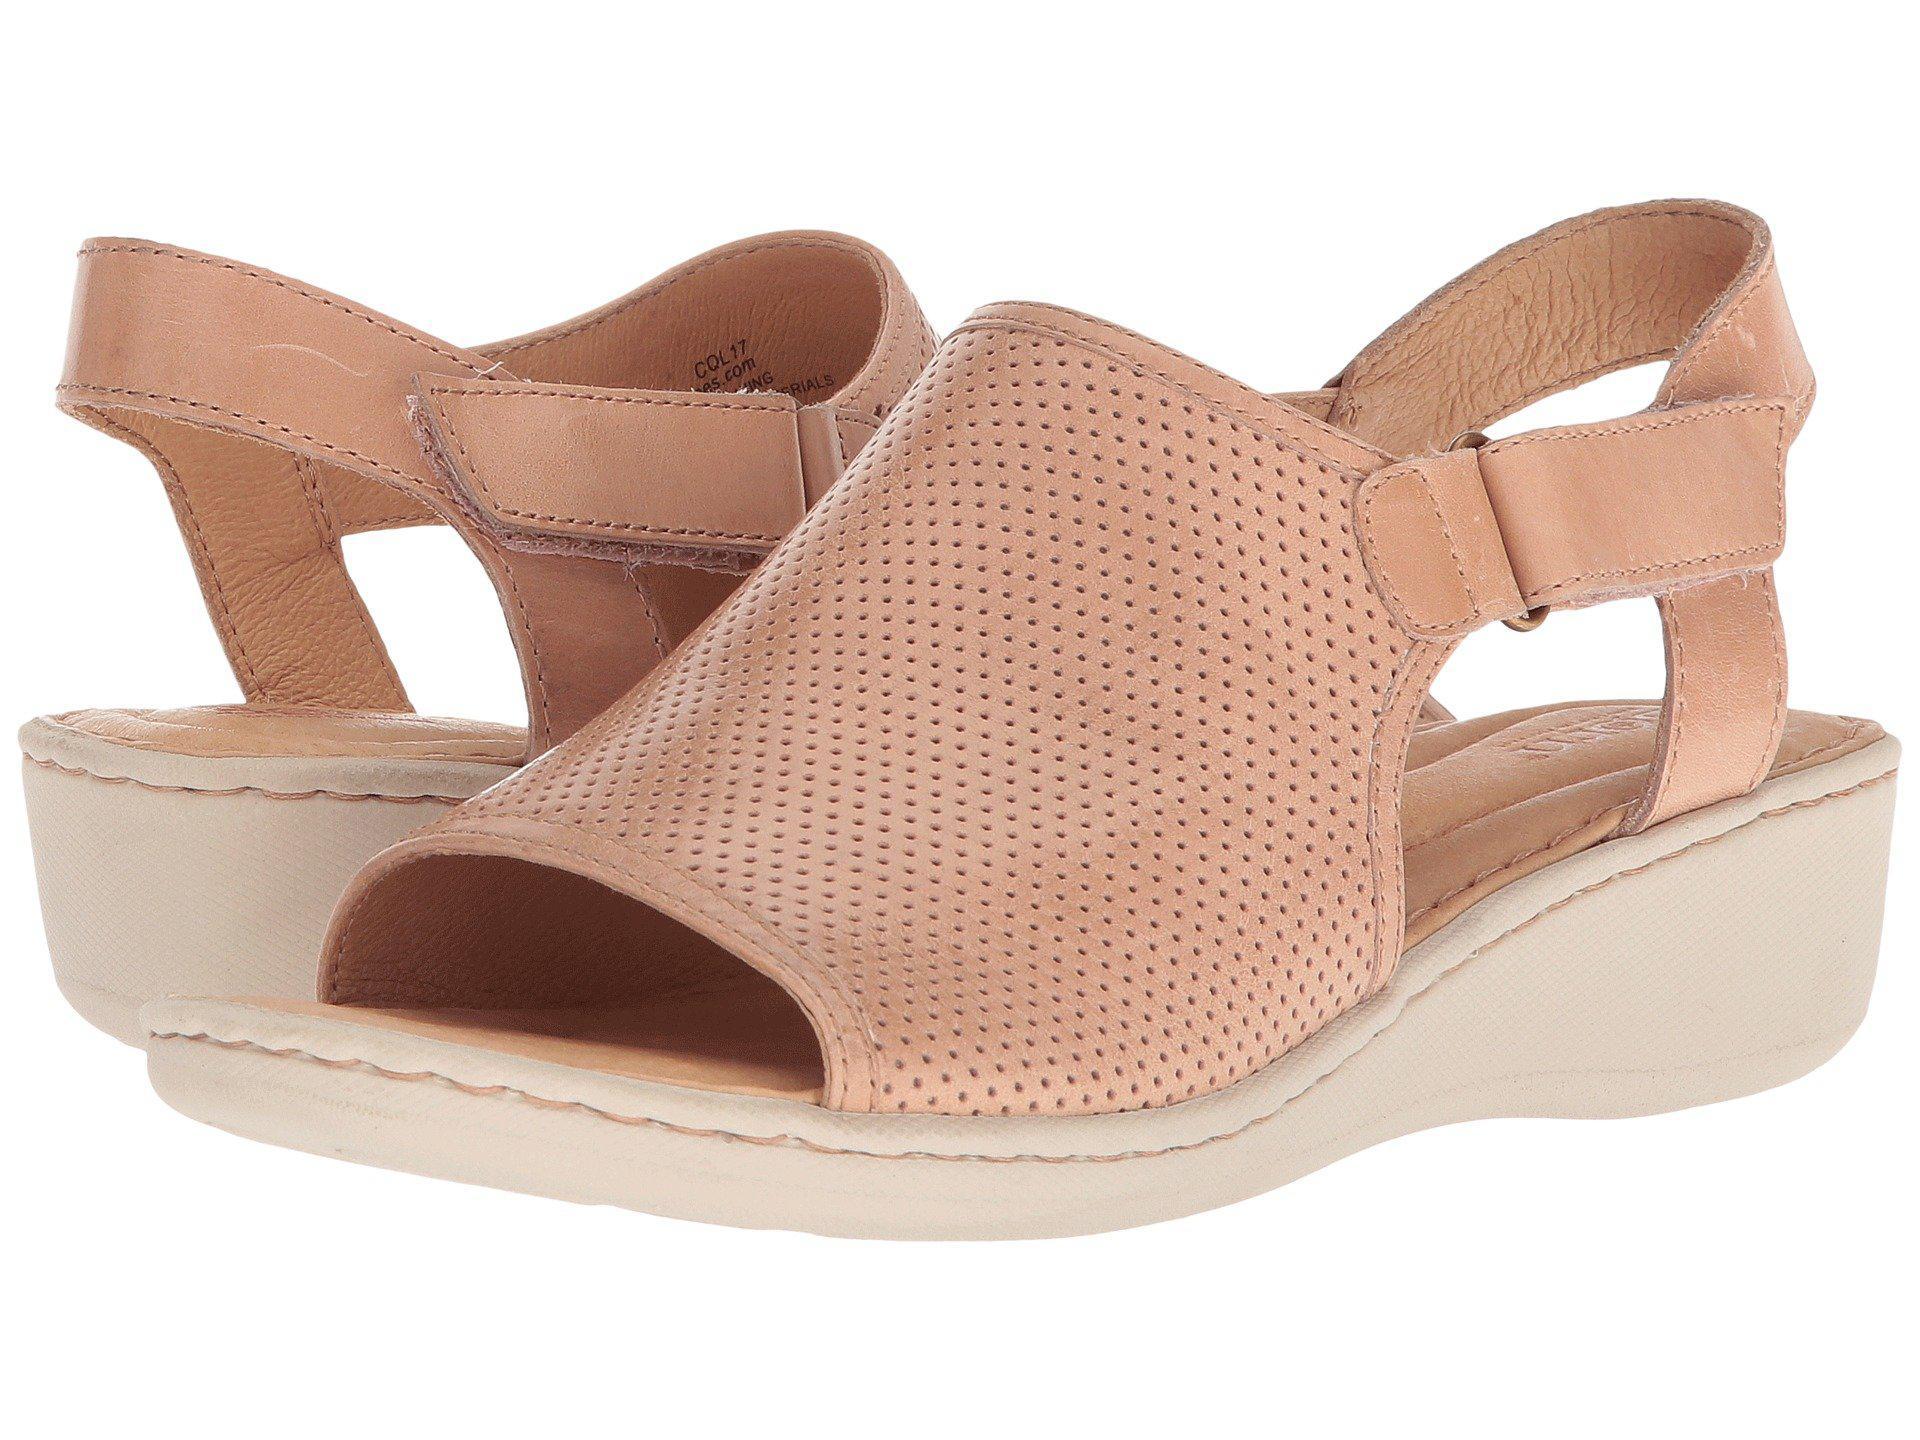 Born Salvia Perforated Wedge Sandals XJq8lTu